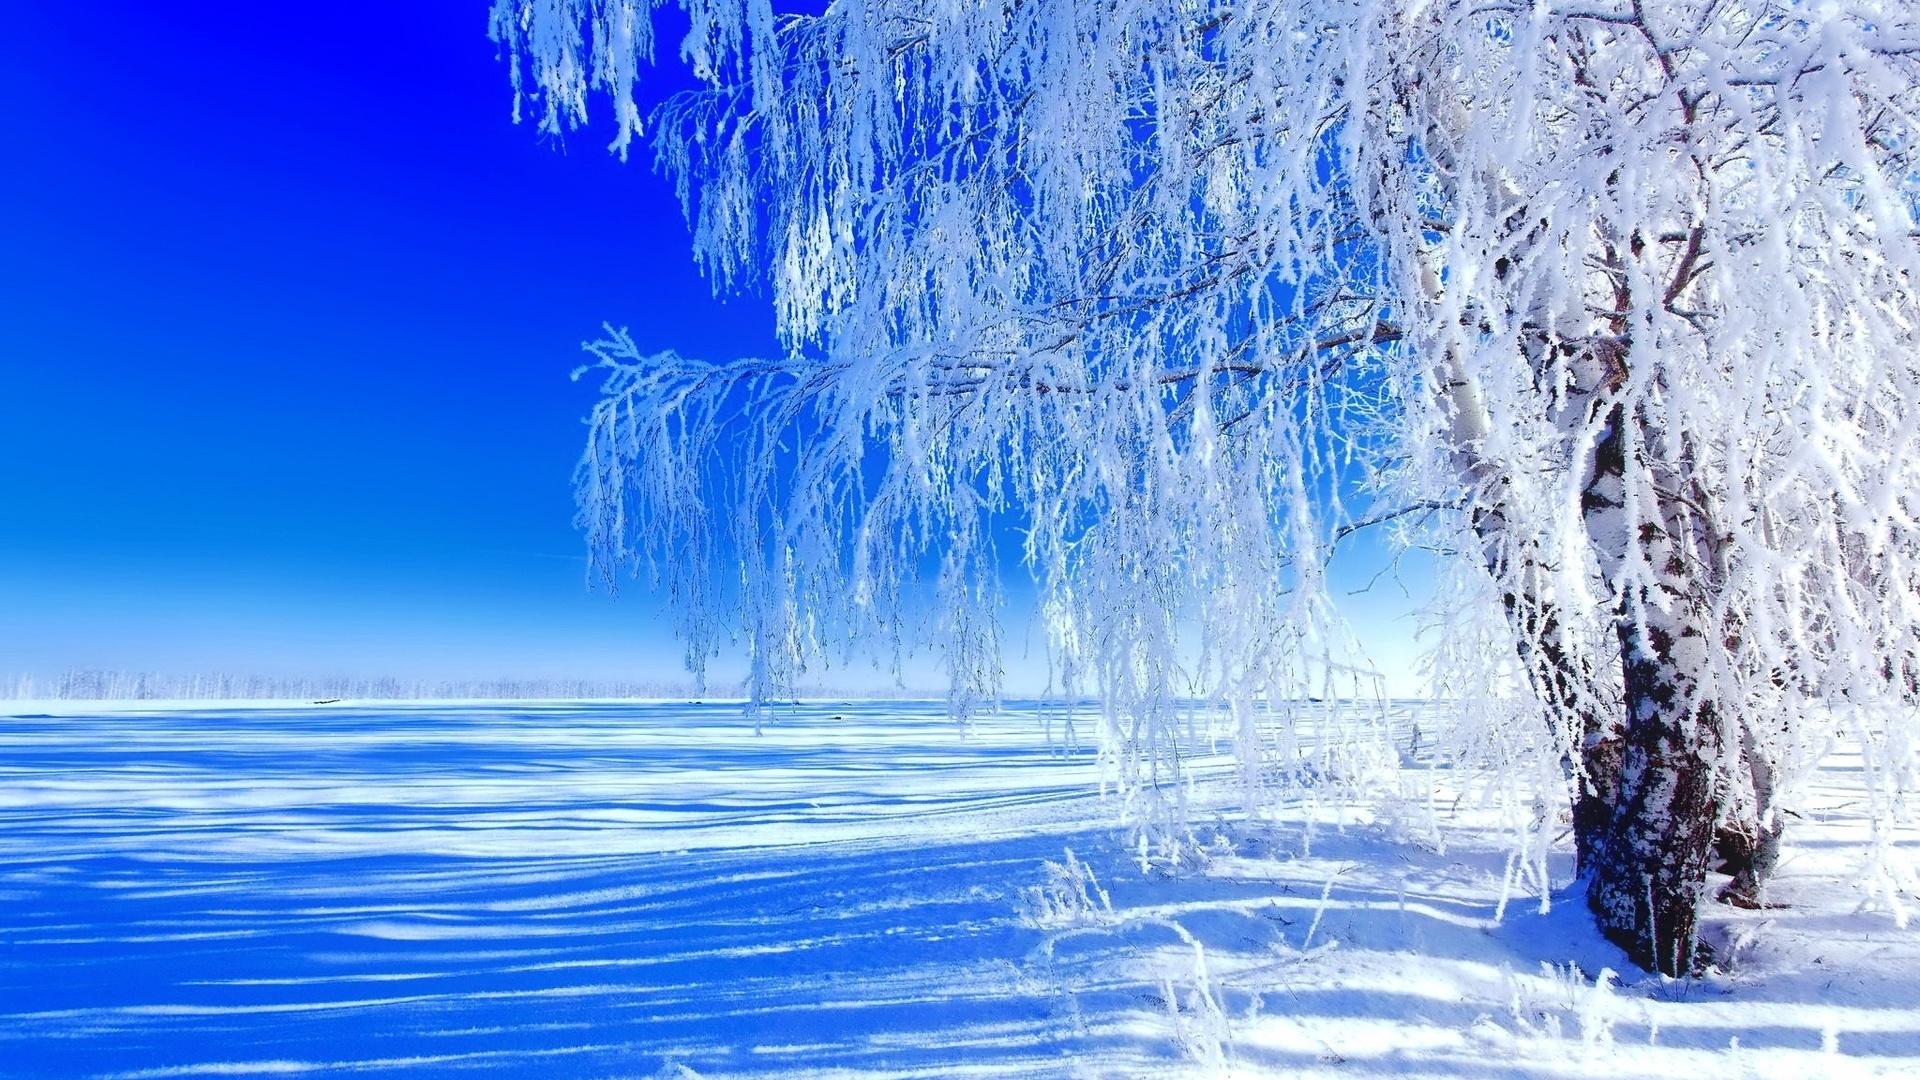 Открытки доброе утро зимний пейзаж, своими